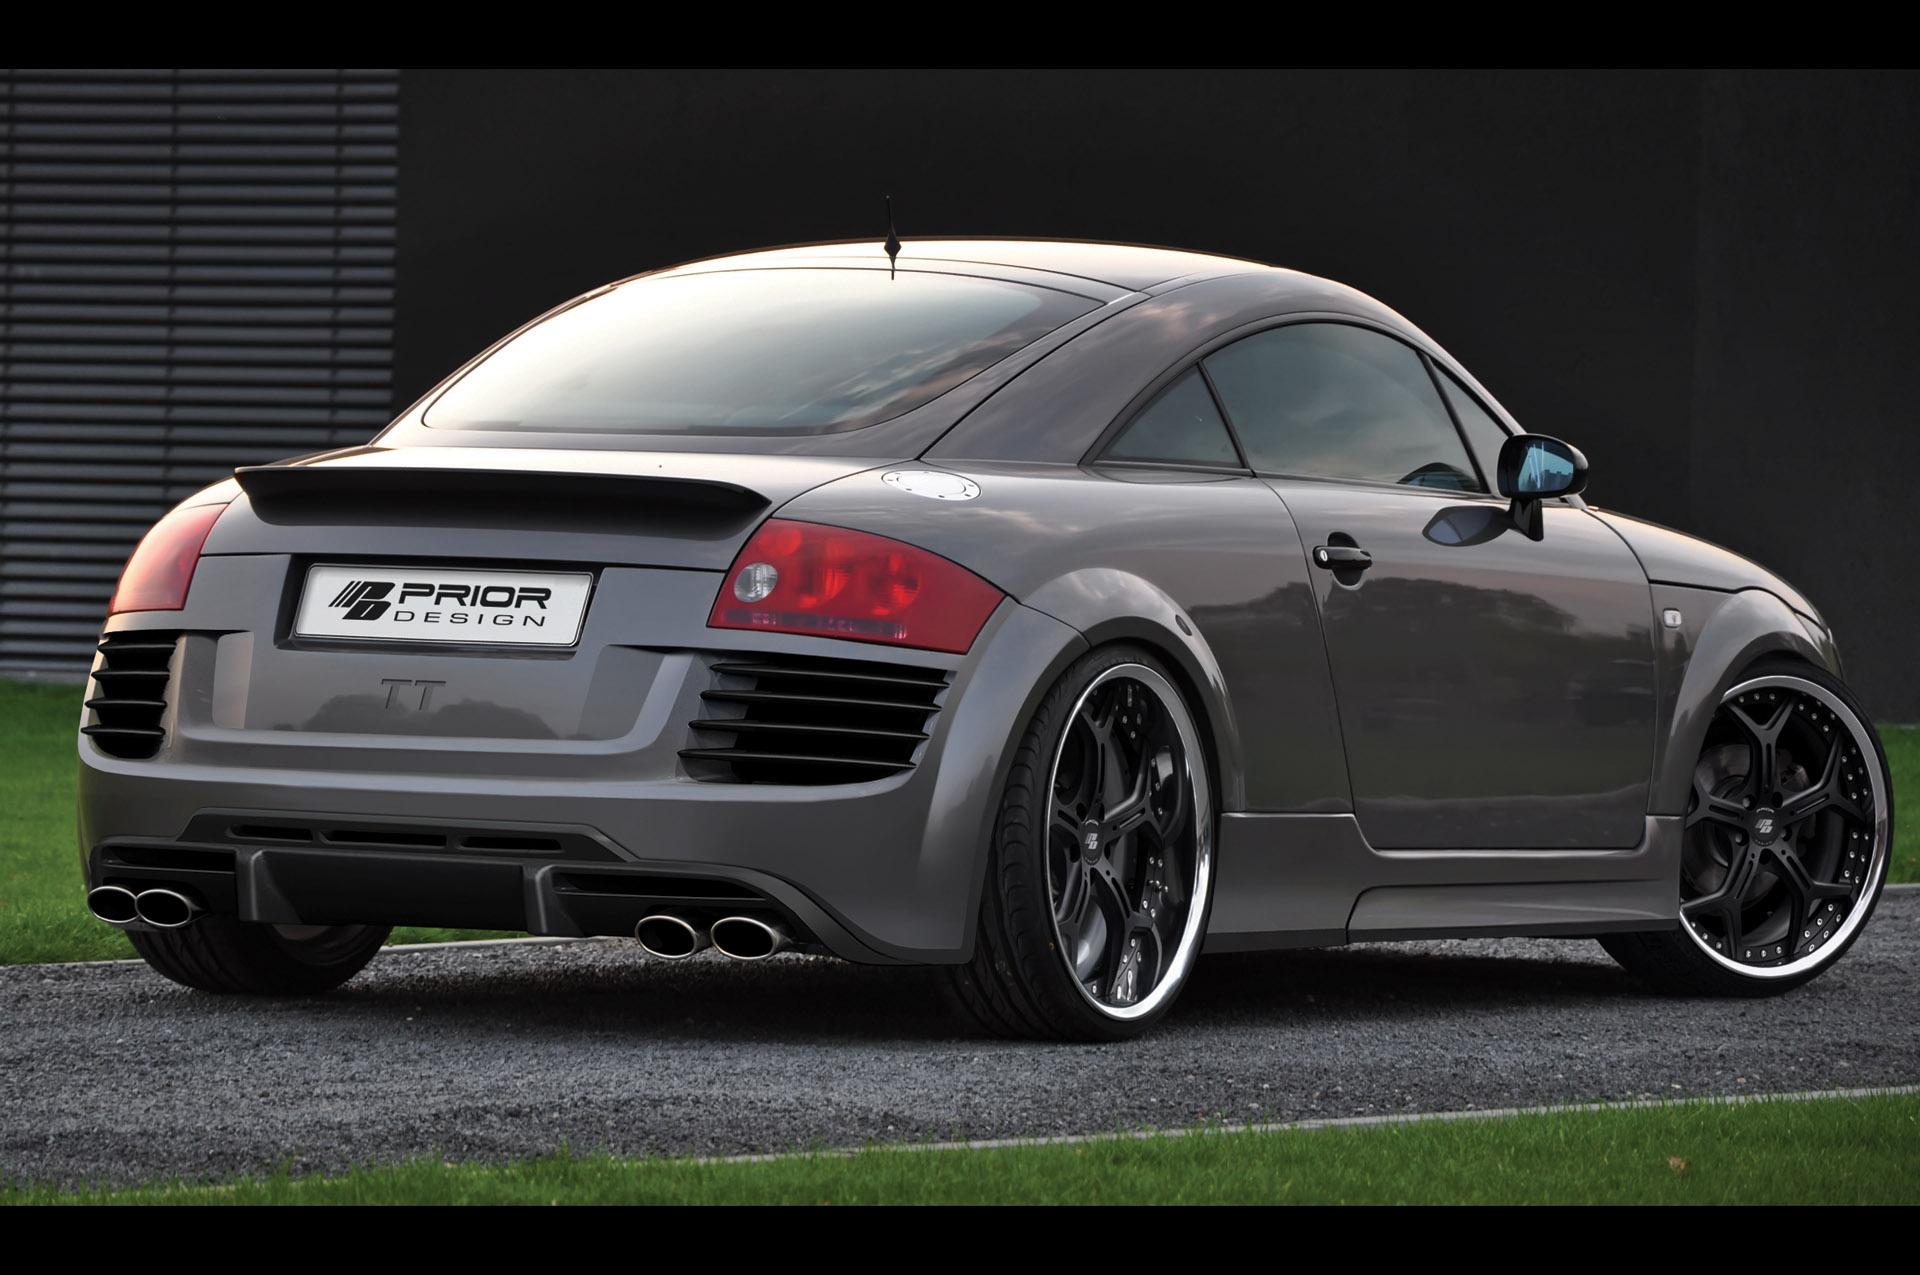 Prior Design Audi TT aerodynamic kit